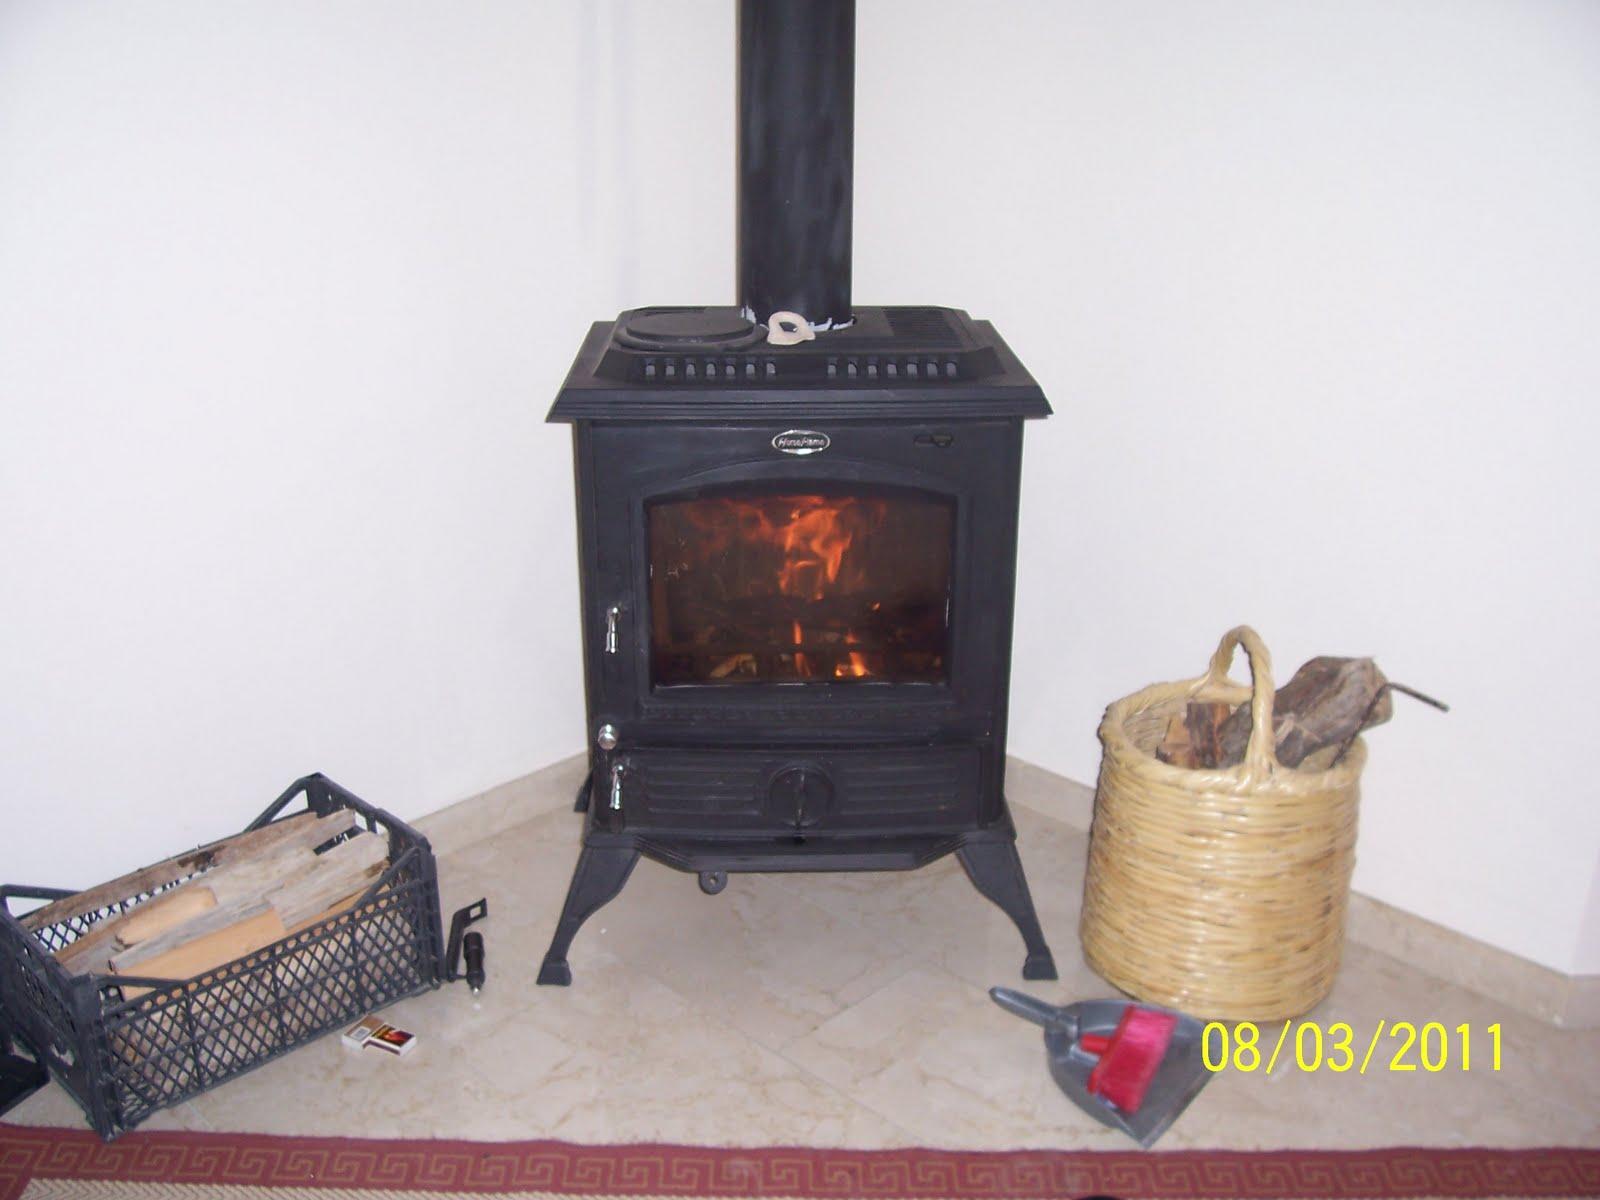 The Cyprus Garden Blog: Wood Burning Stove